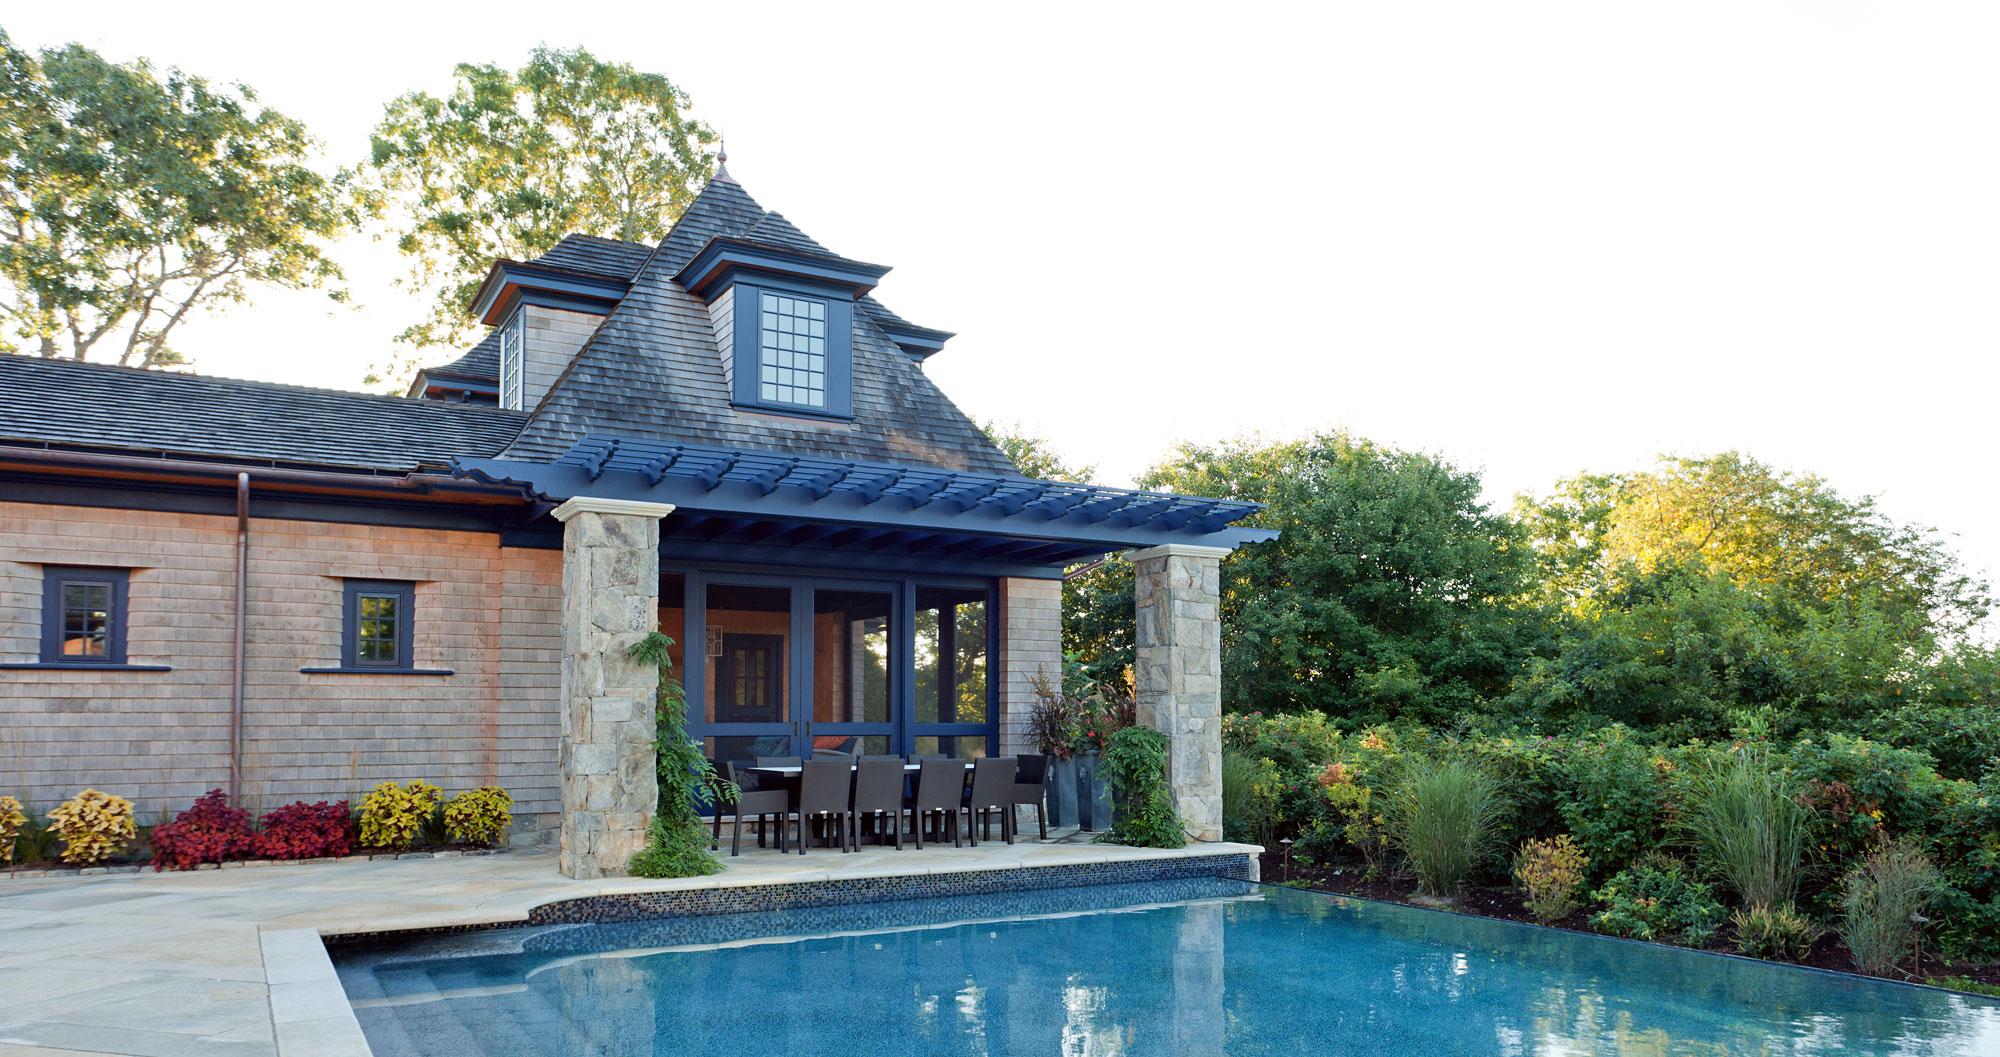 Stephen Sullivan Custom Home Builders Rhode Island Coastal Vacation Home -4